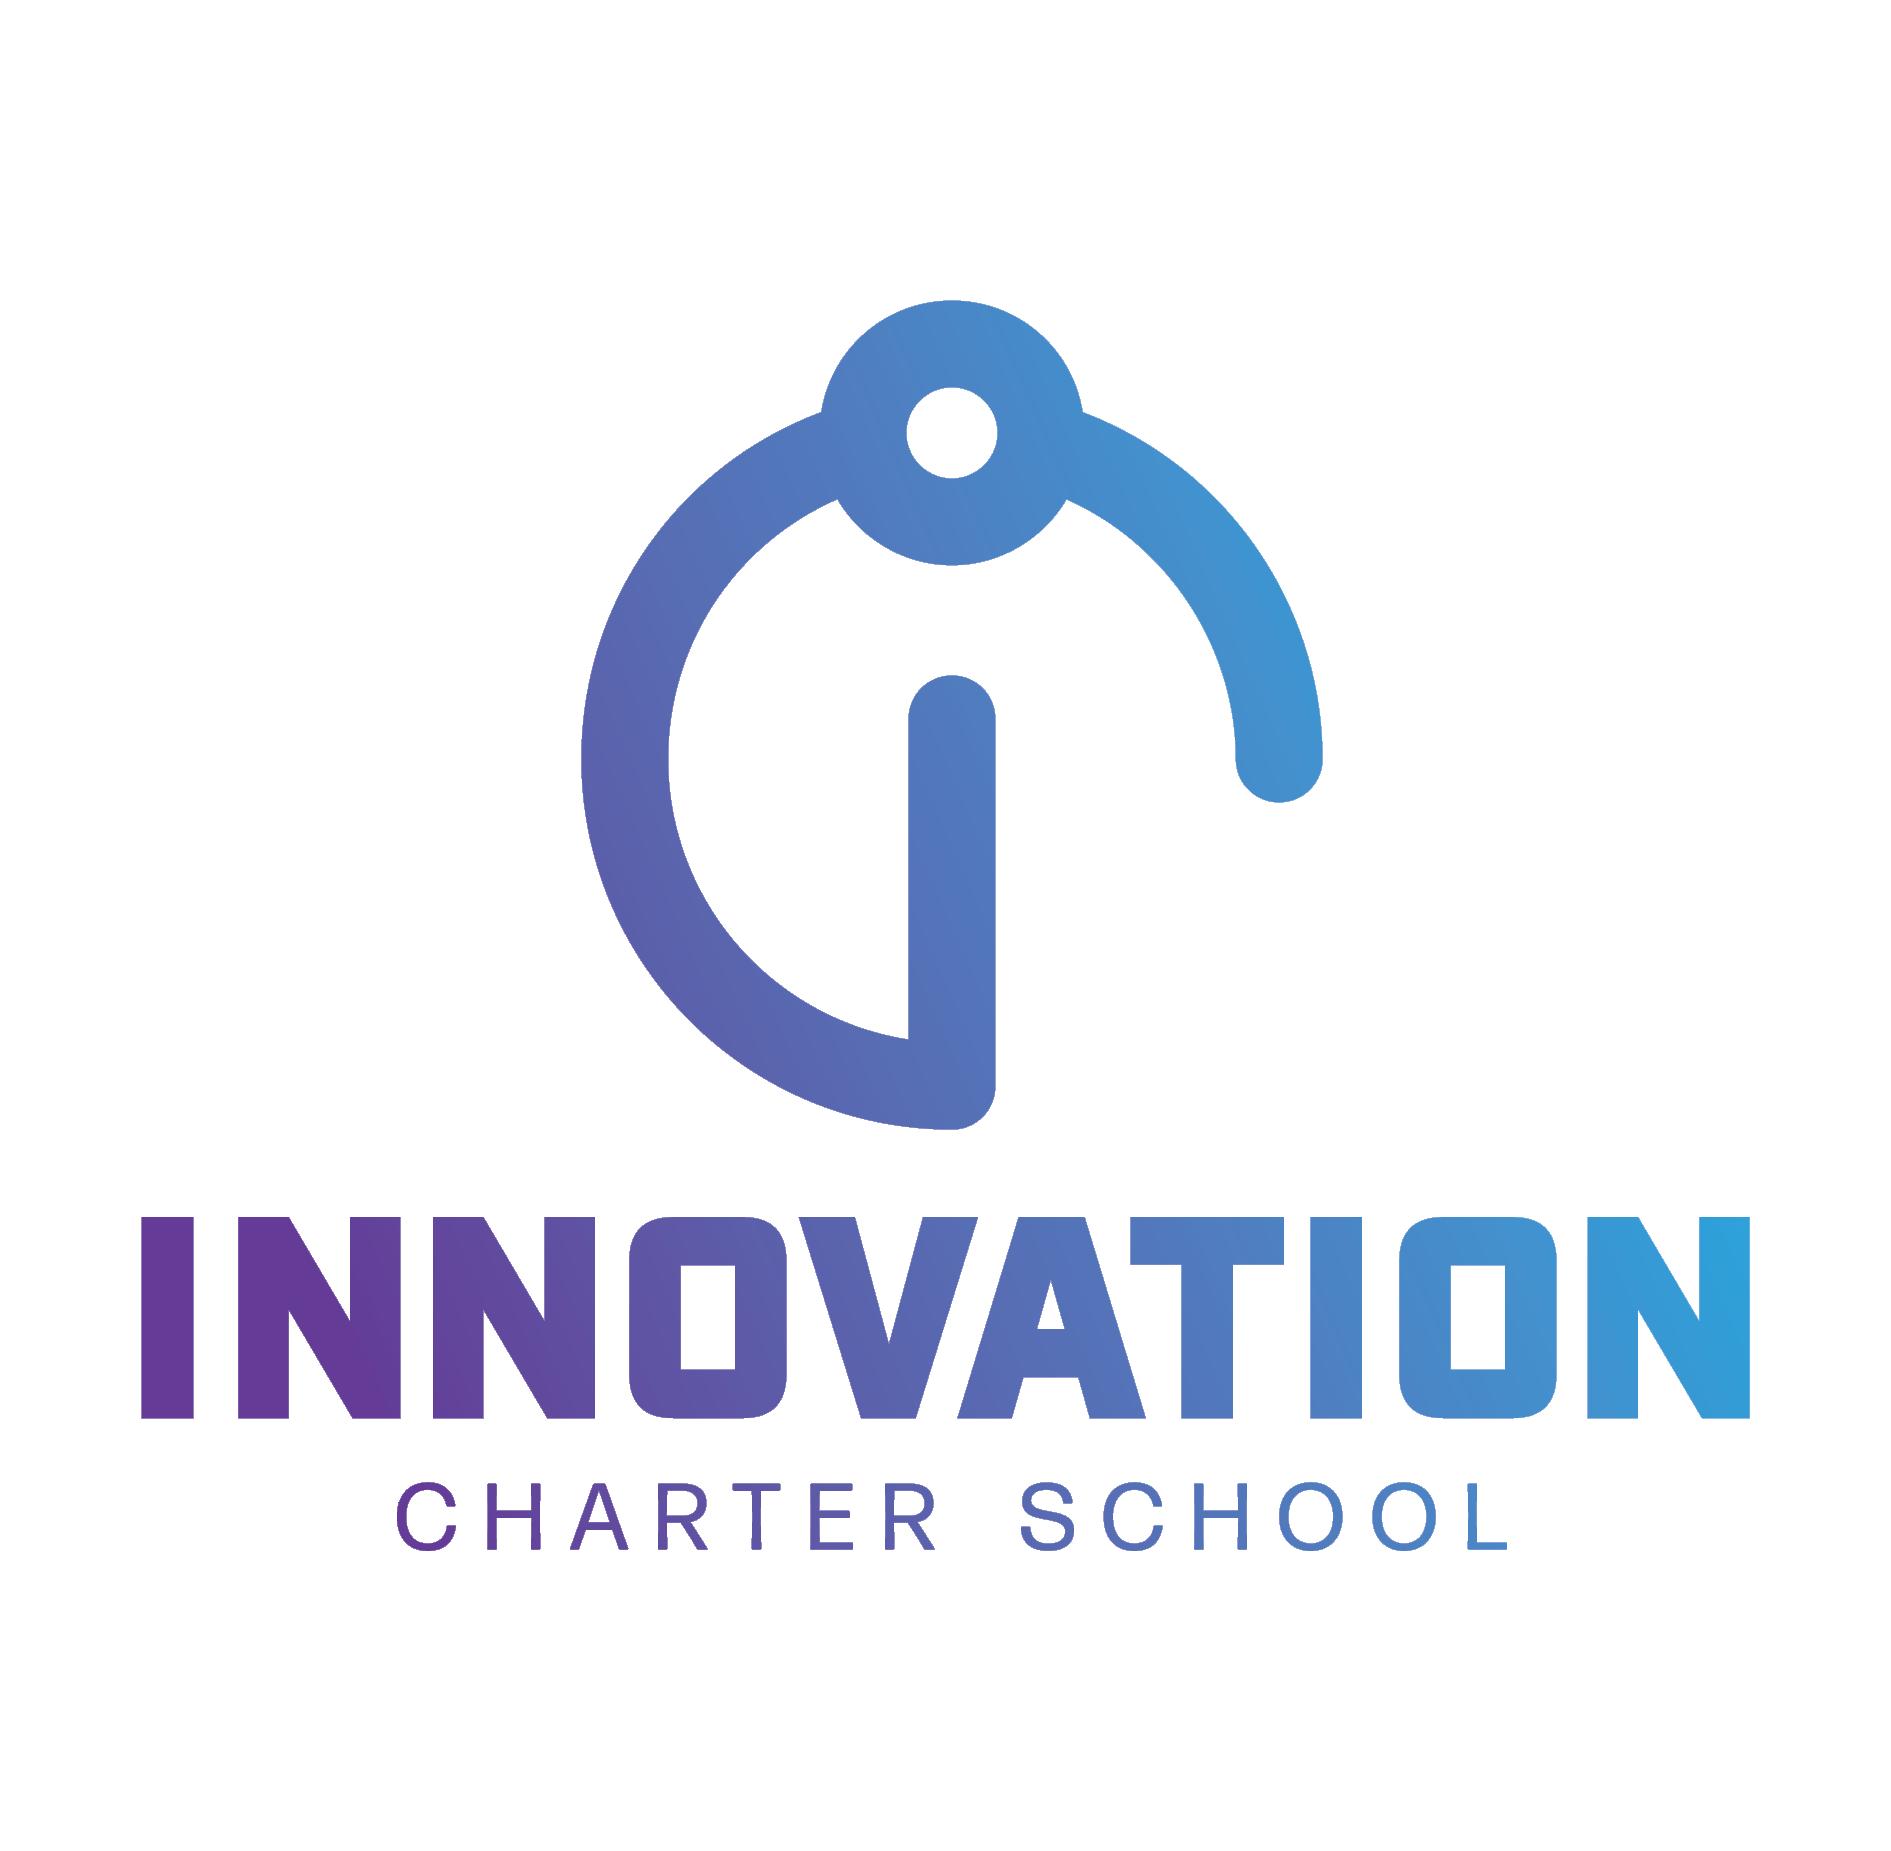 Innovation Charter School